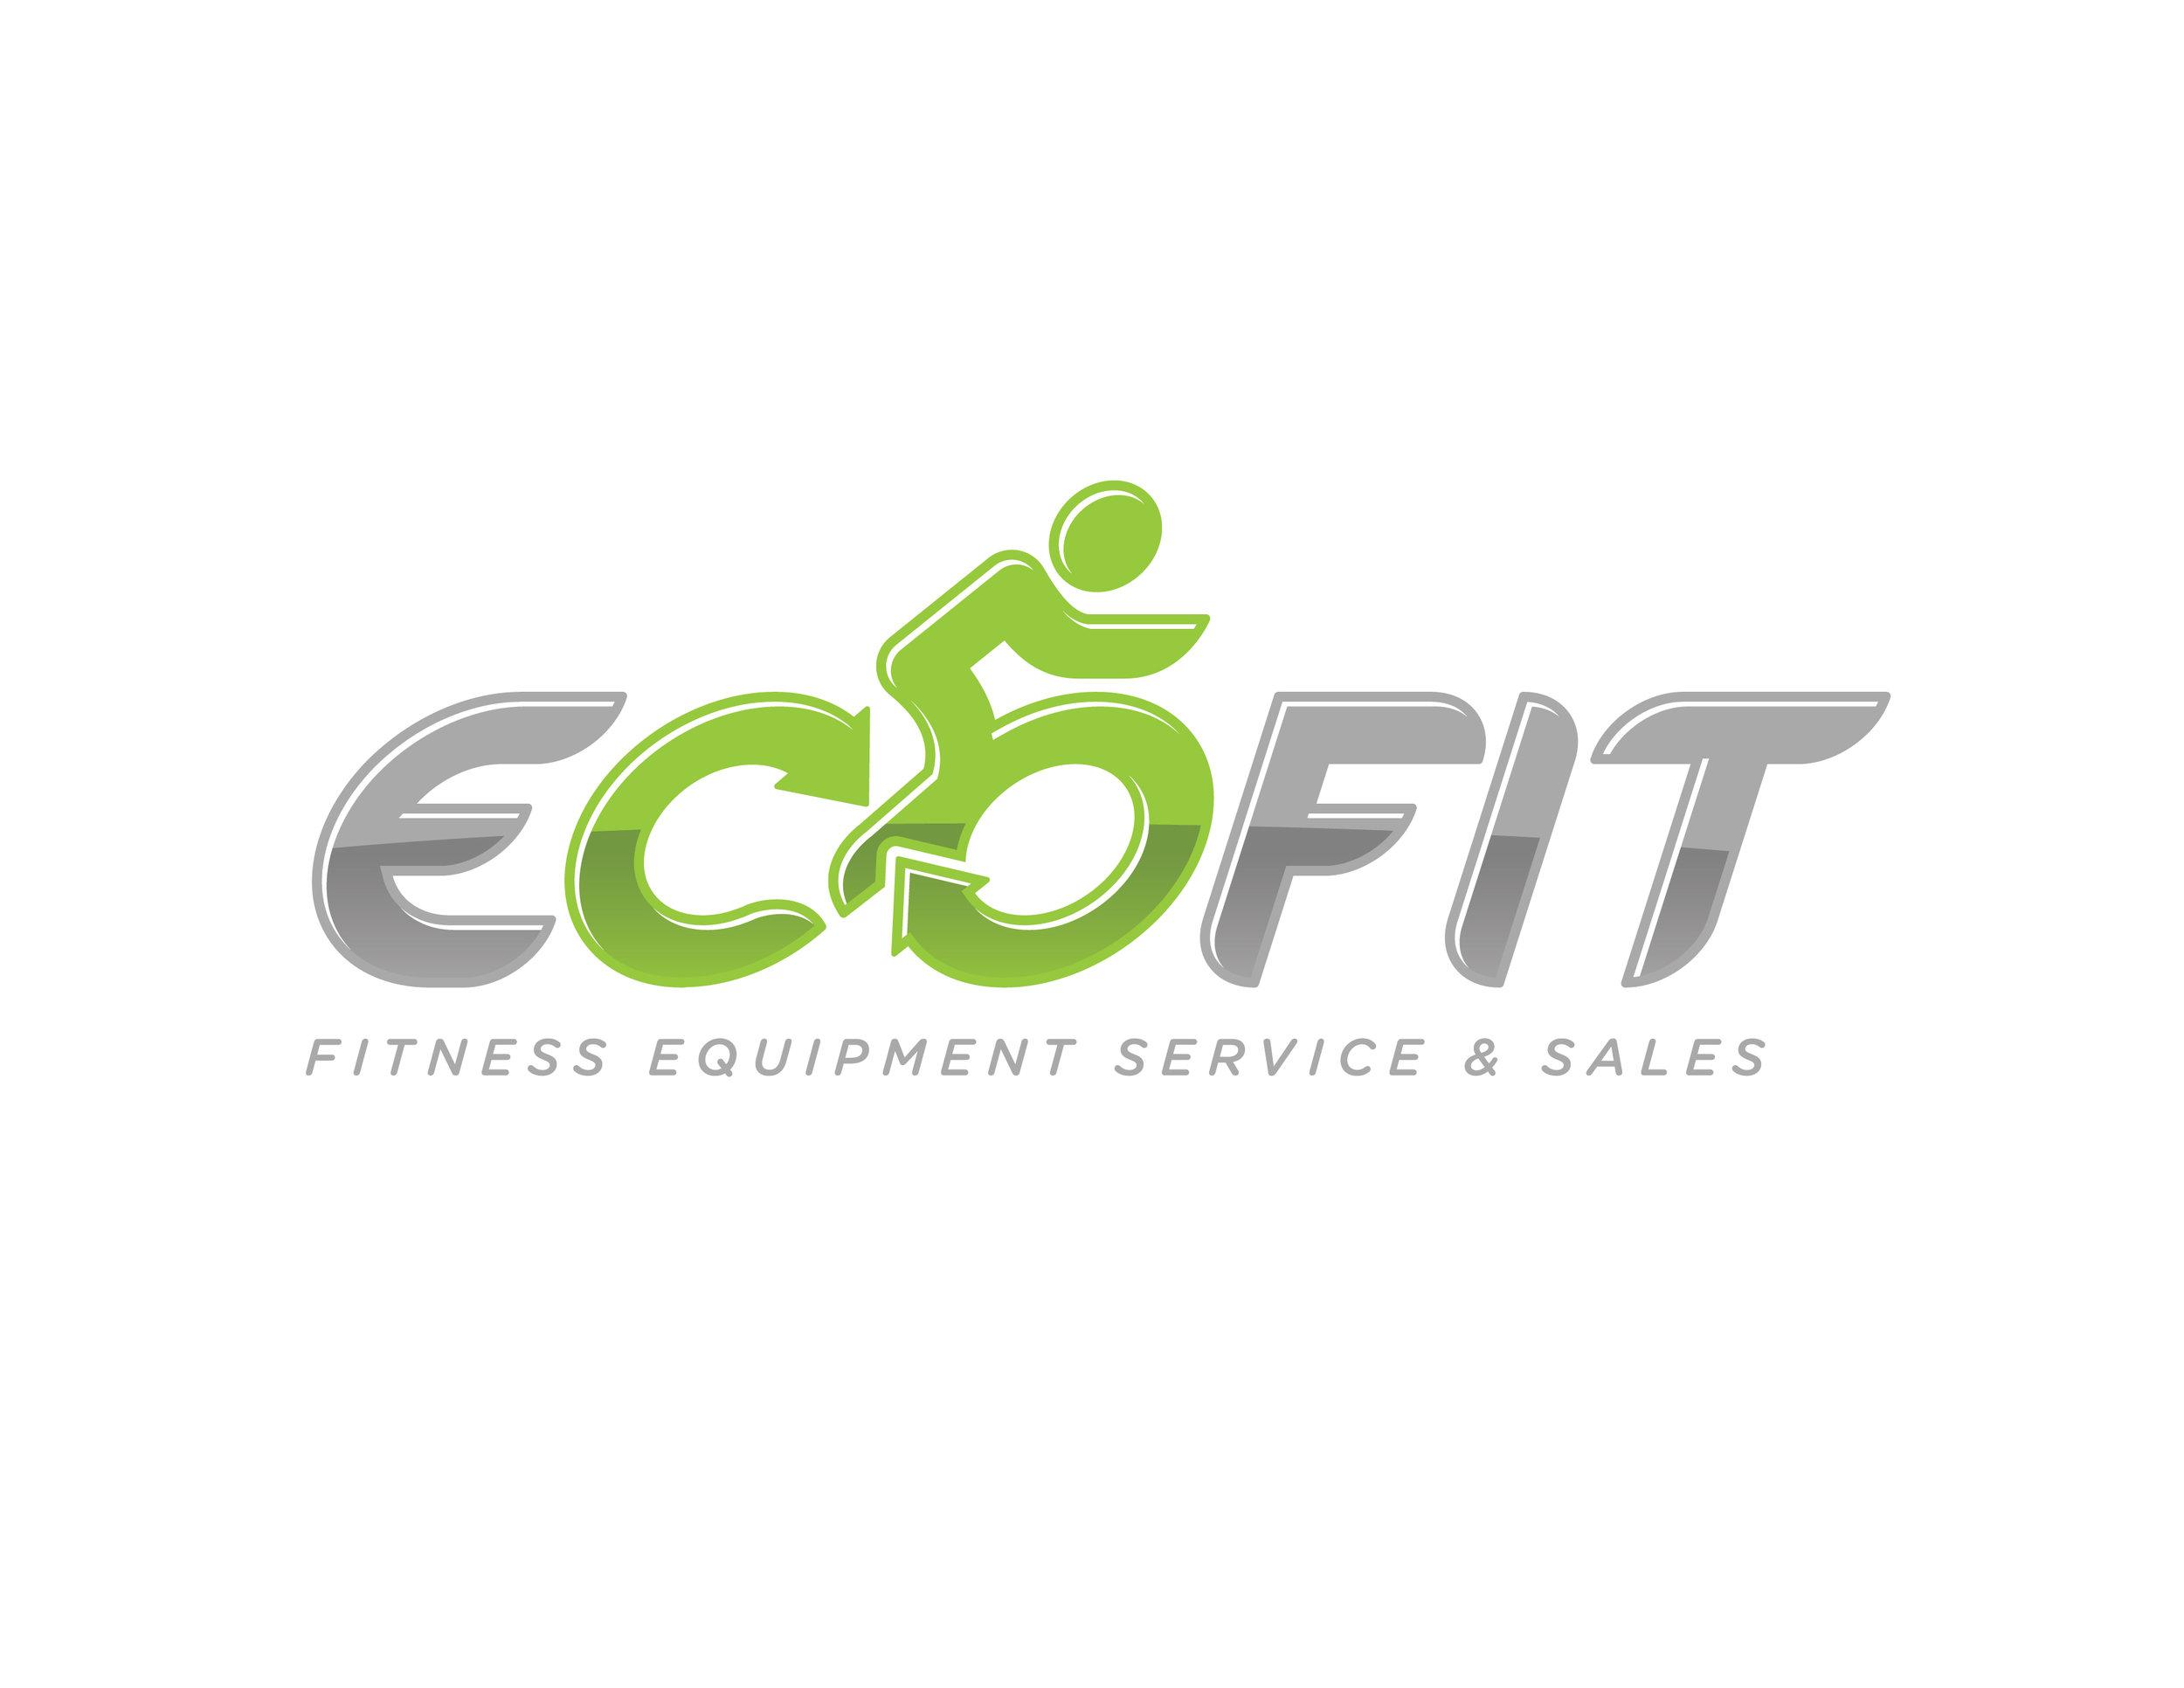 EcoFit_Equipment_Logo_MASTER_RGB-01.jpg